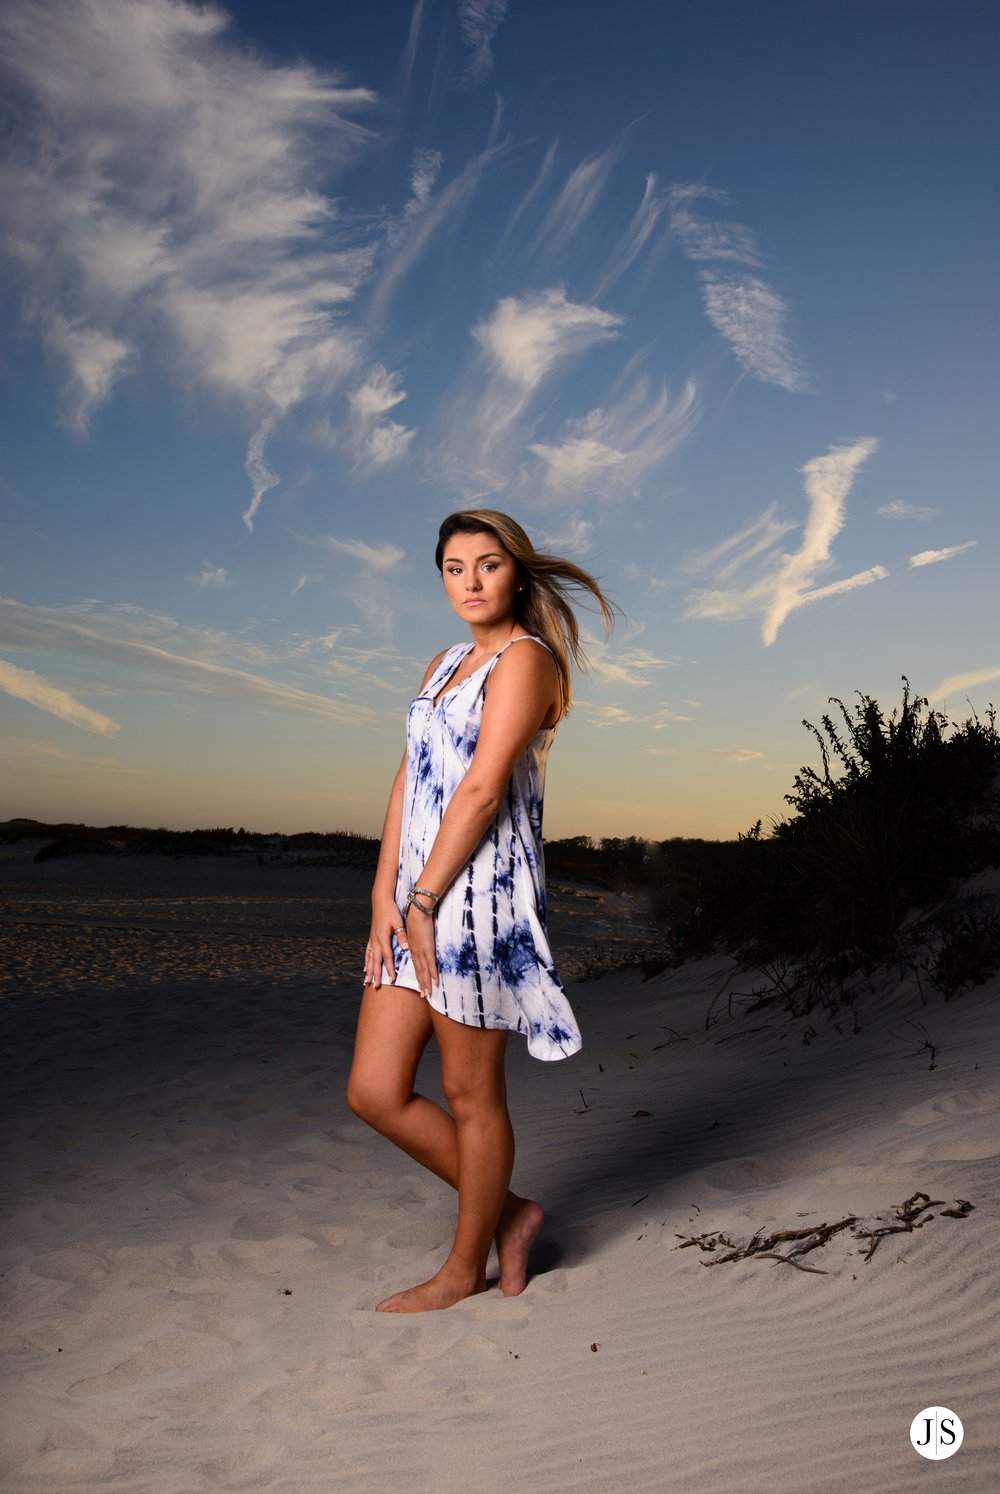 senior-portraits-beach-sunset-salisbury-assateague-maryland-photo 11.jpg